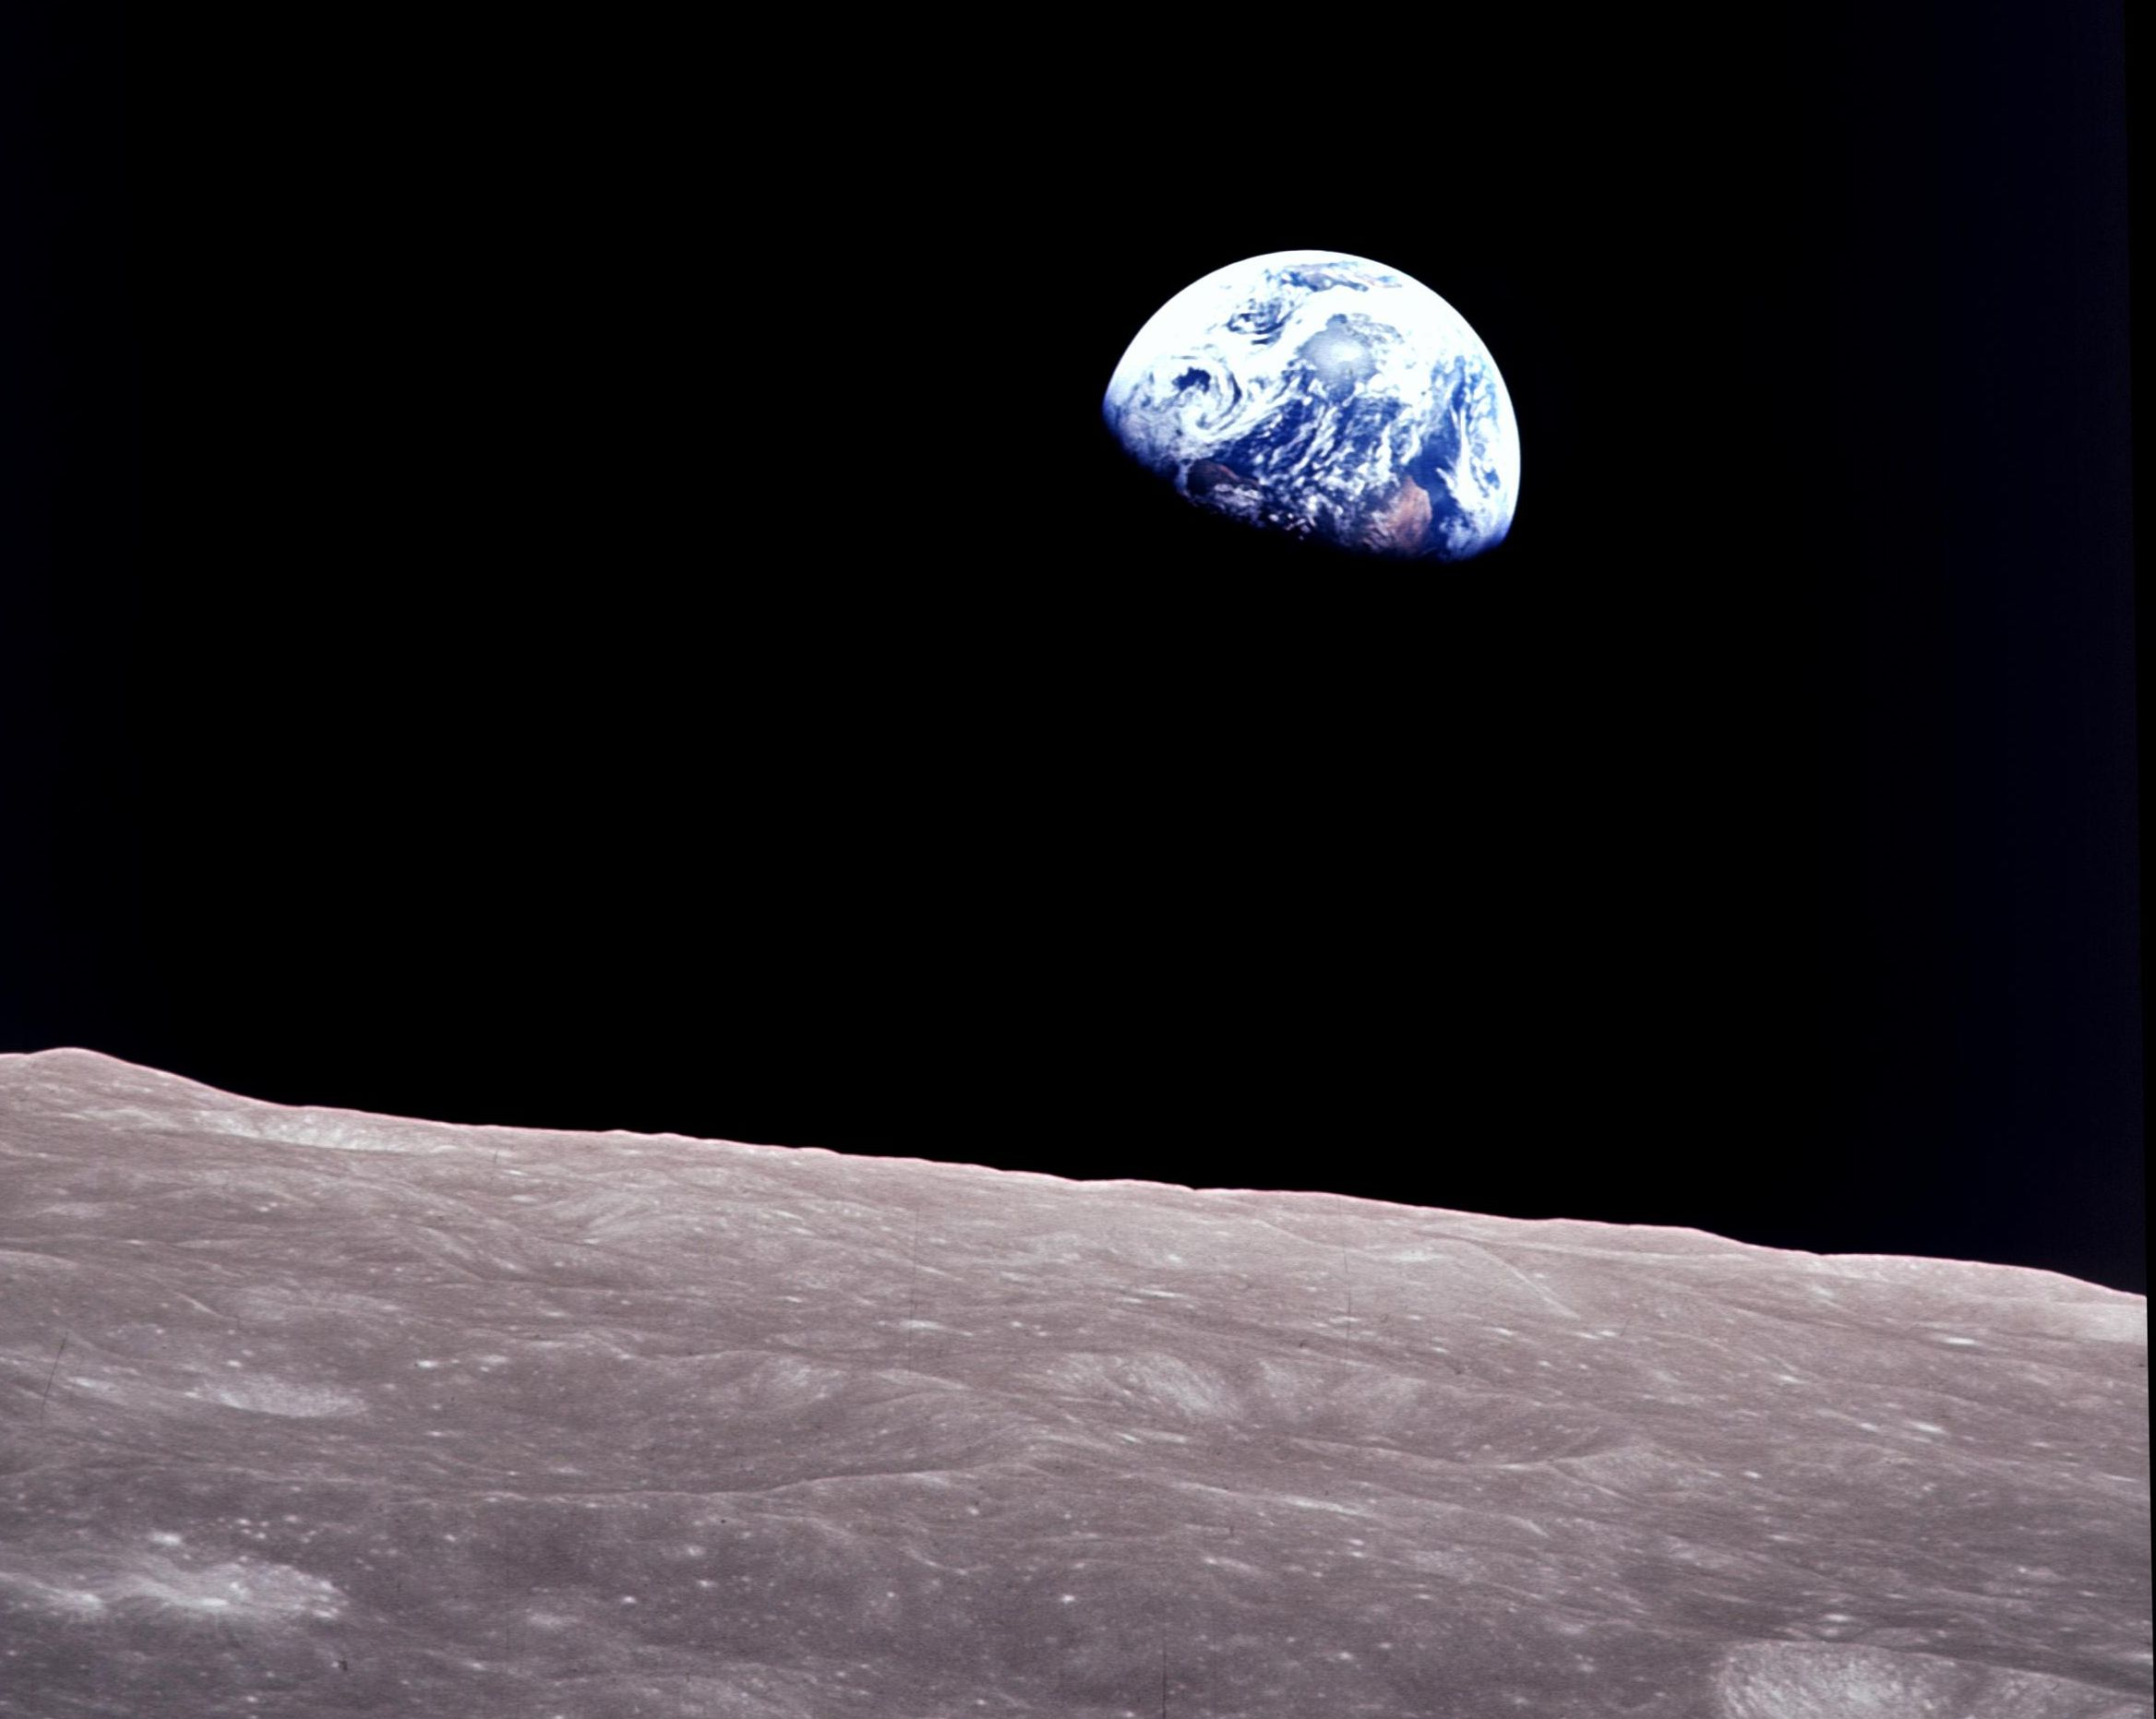 Earthrise William Anders 1968 Apollo 8 Astronaut Bill